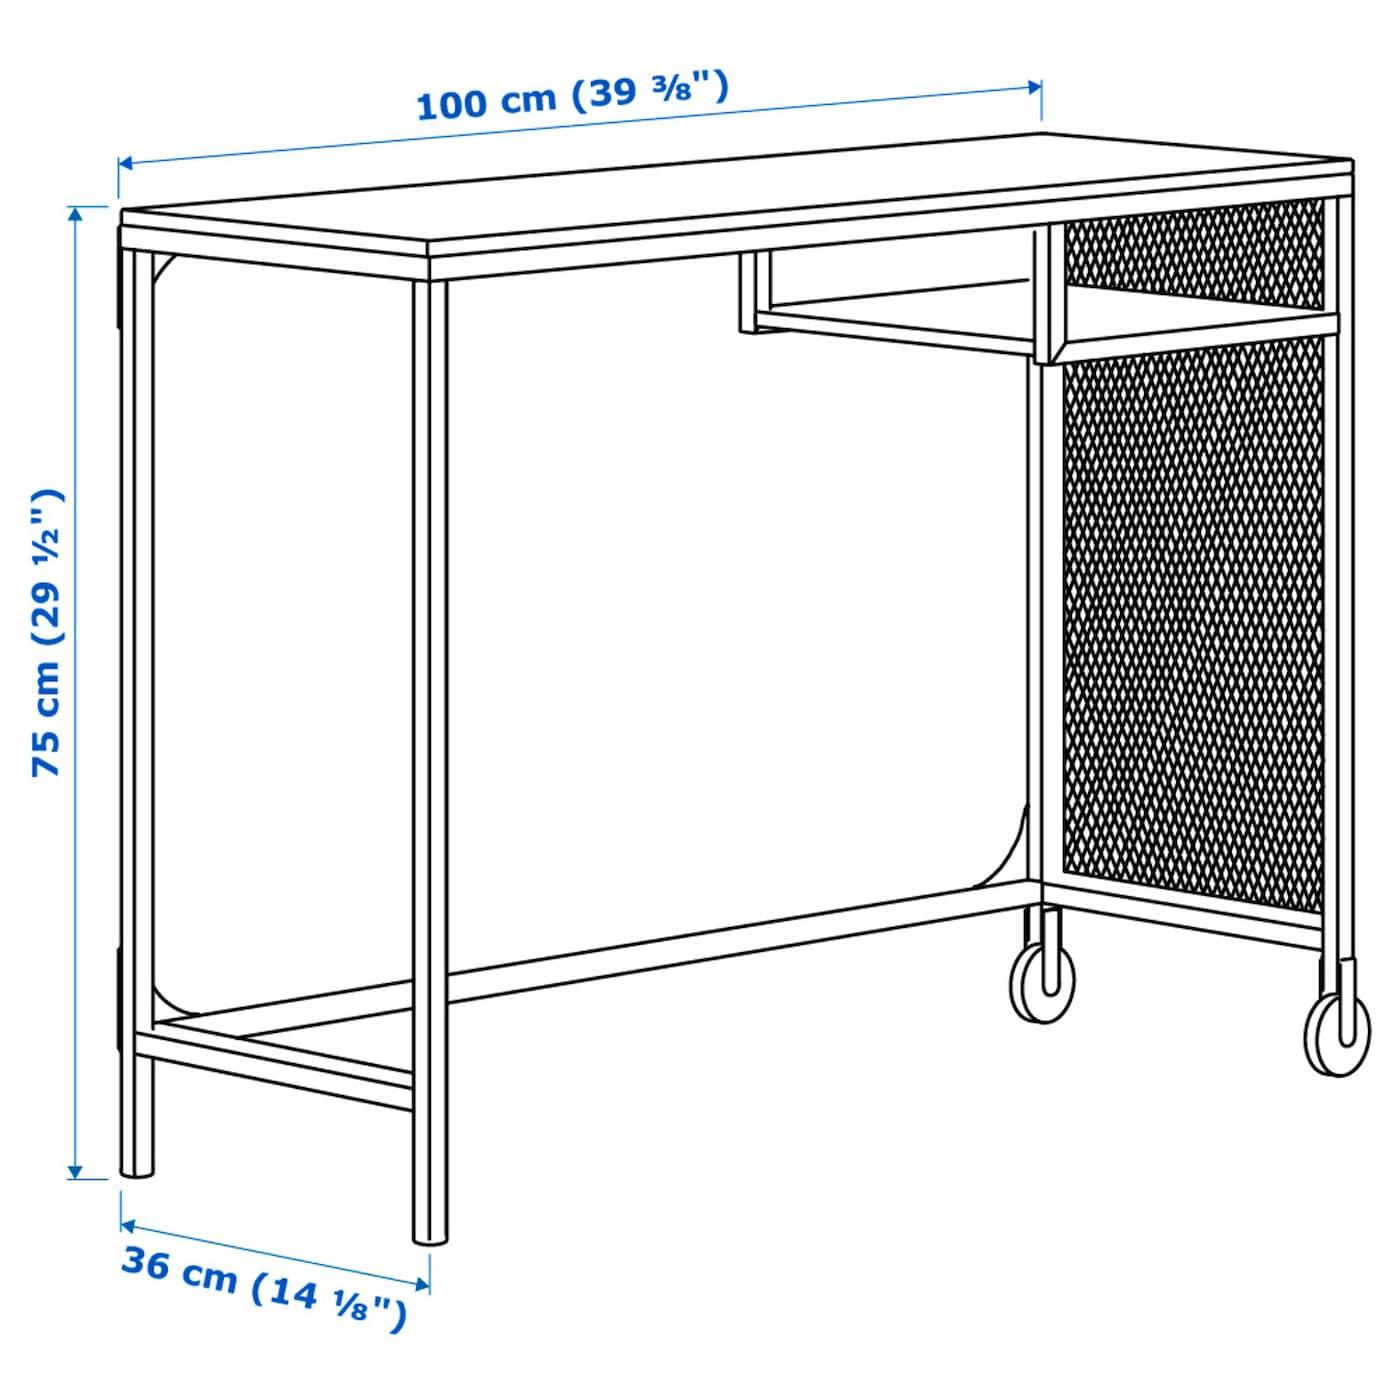 fj llbo laptop table black 100 x 36 cm ikea. Black Bedroom Furniture Sets. Home Design Ideas